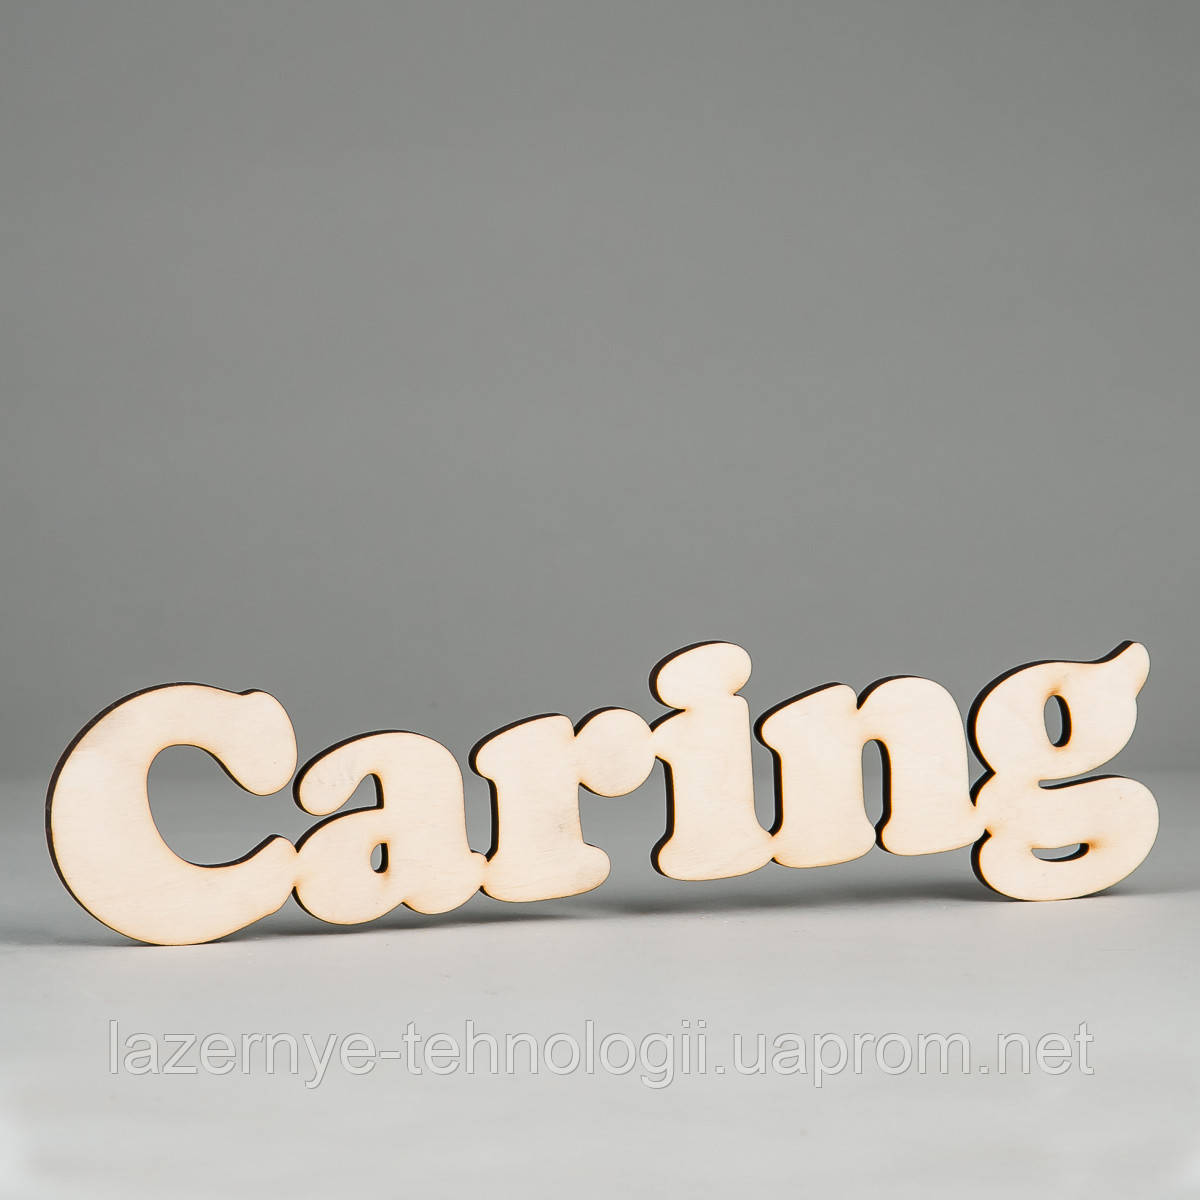 "Слова из дерева ""Caring"""